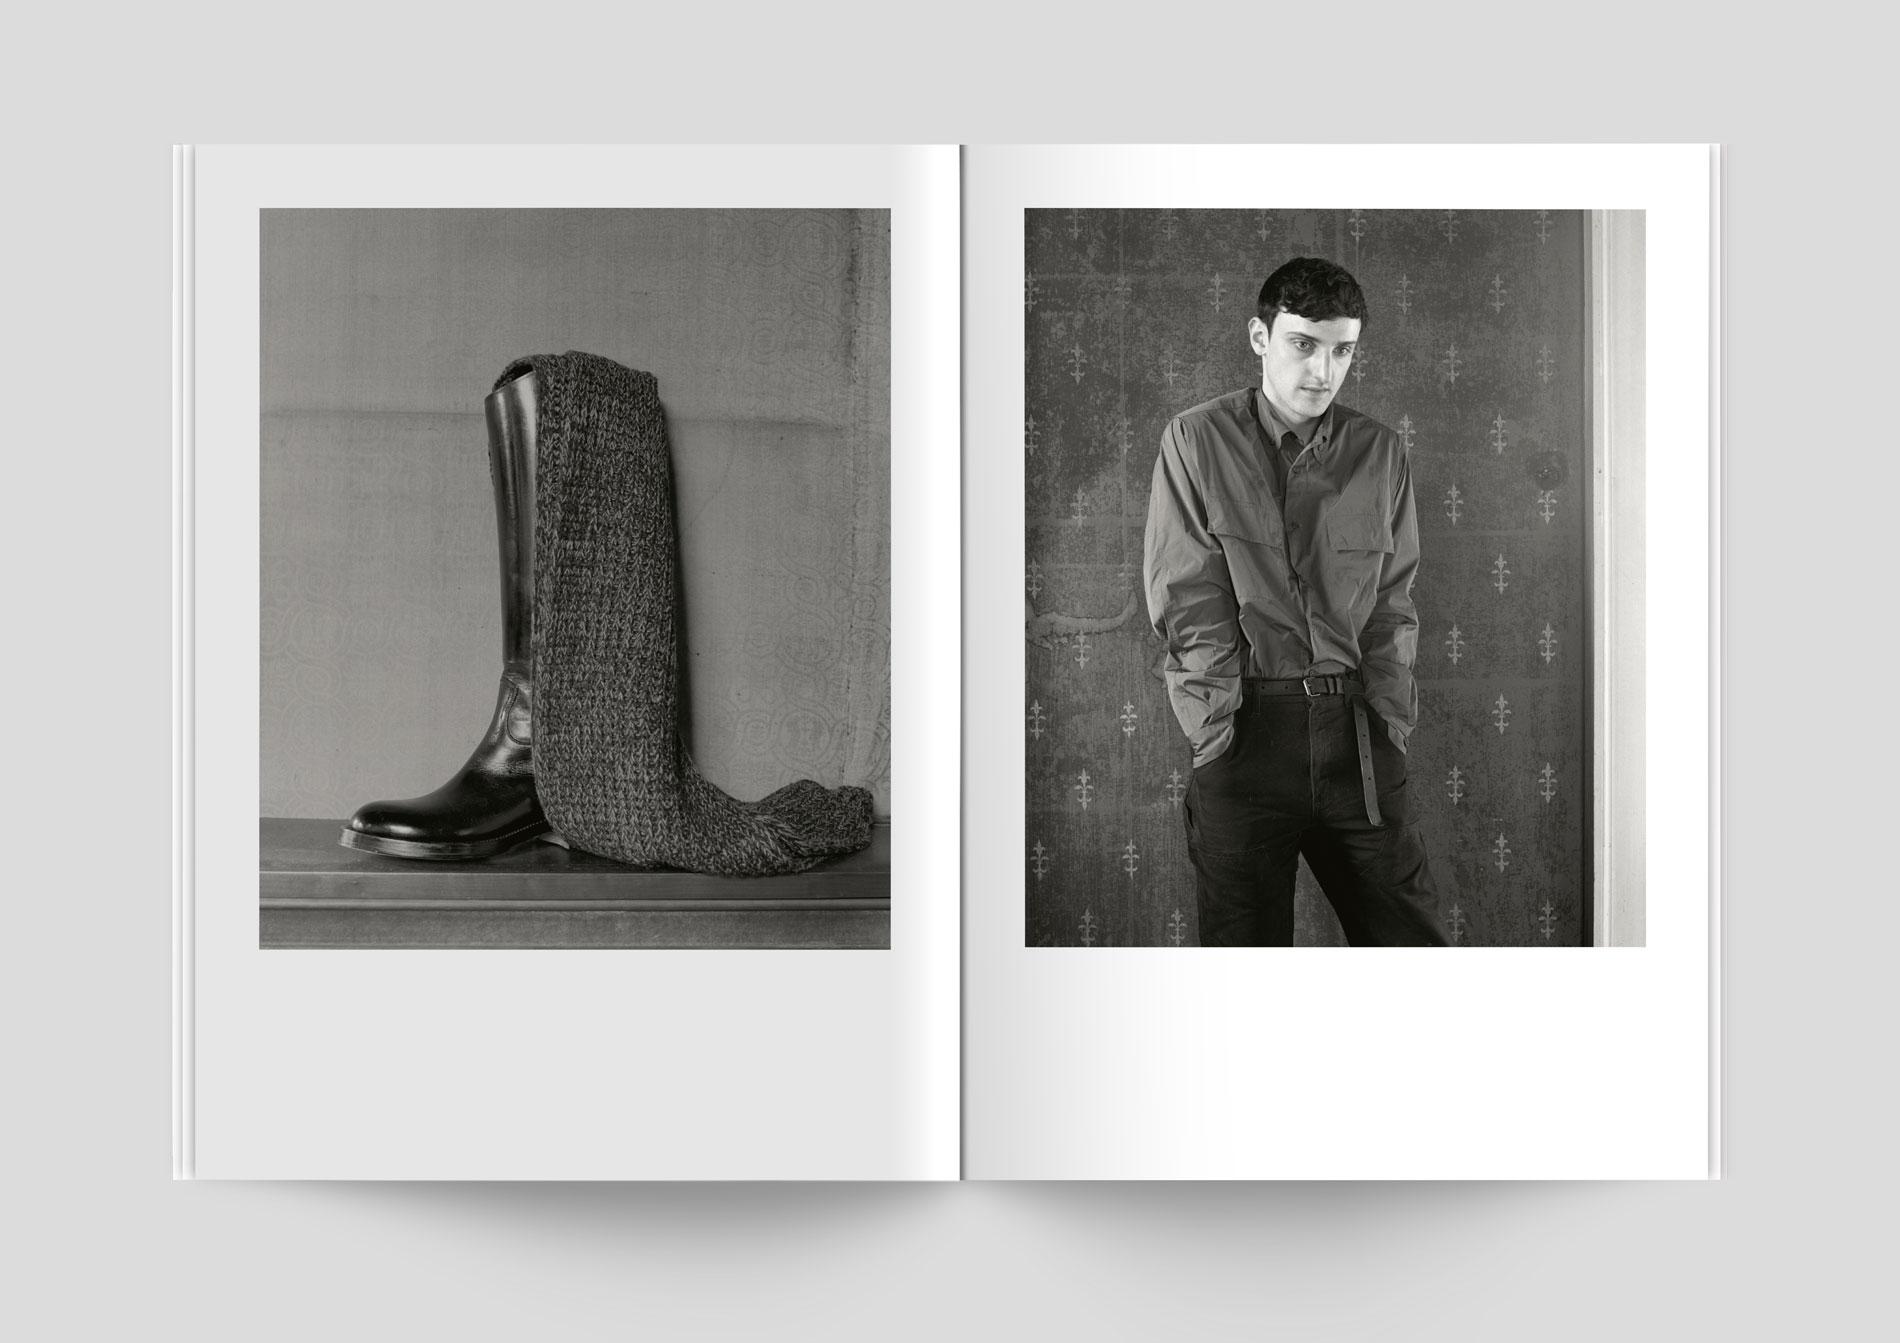 Santoni-Edited-by-Marco-Zanini-Ingar-Krauss-08